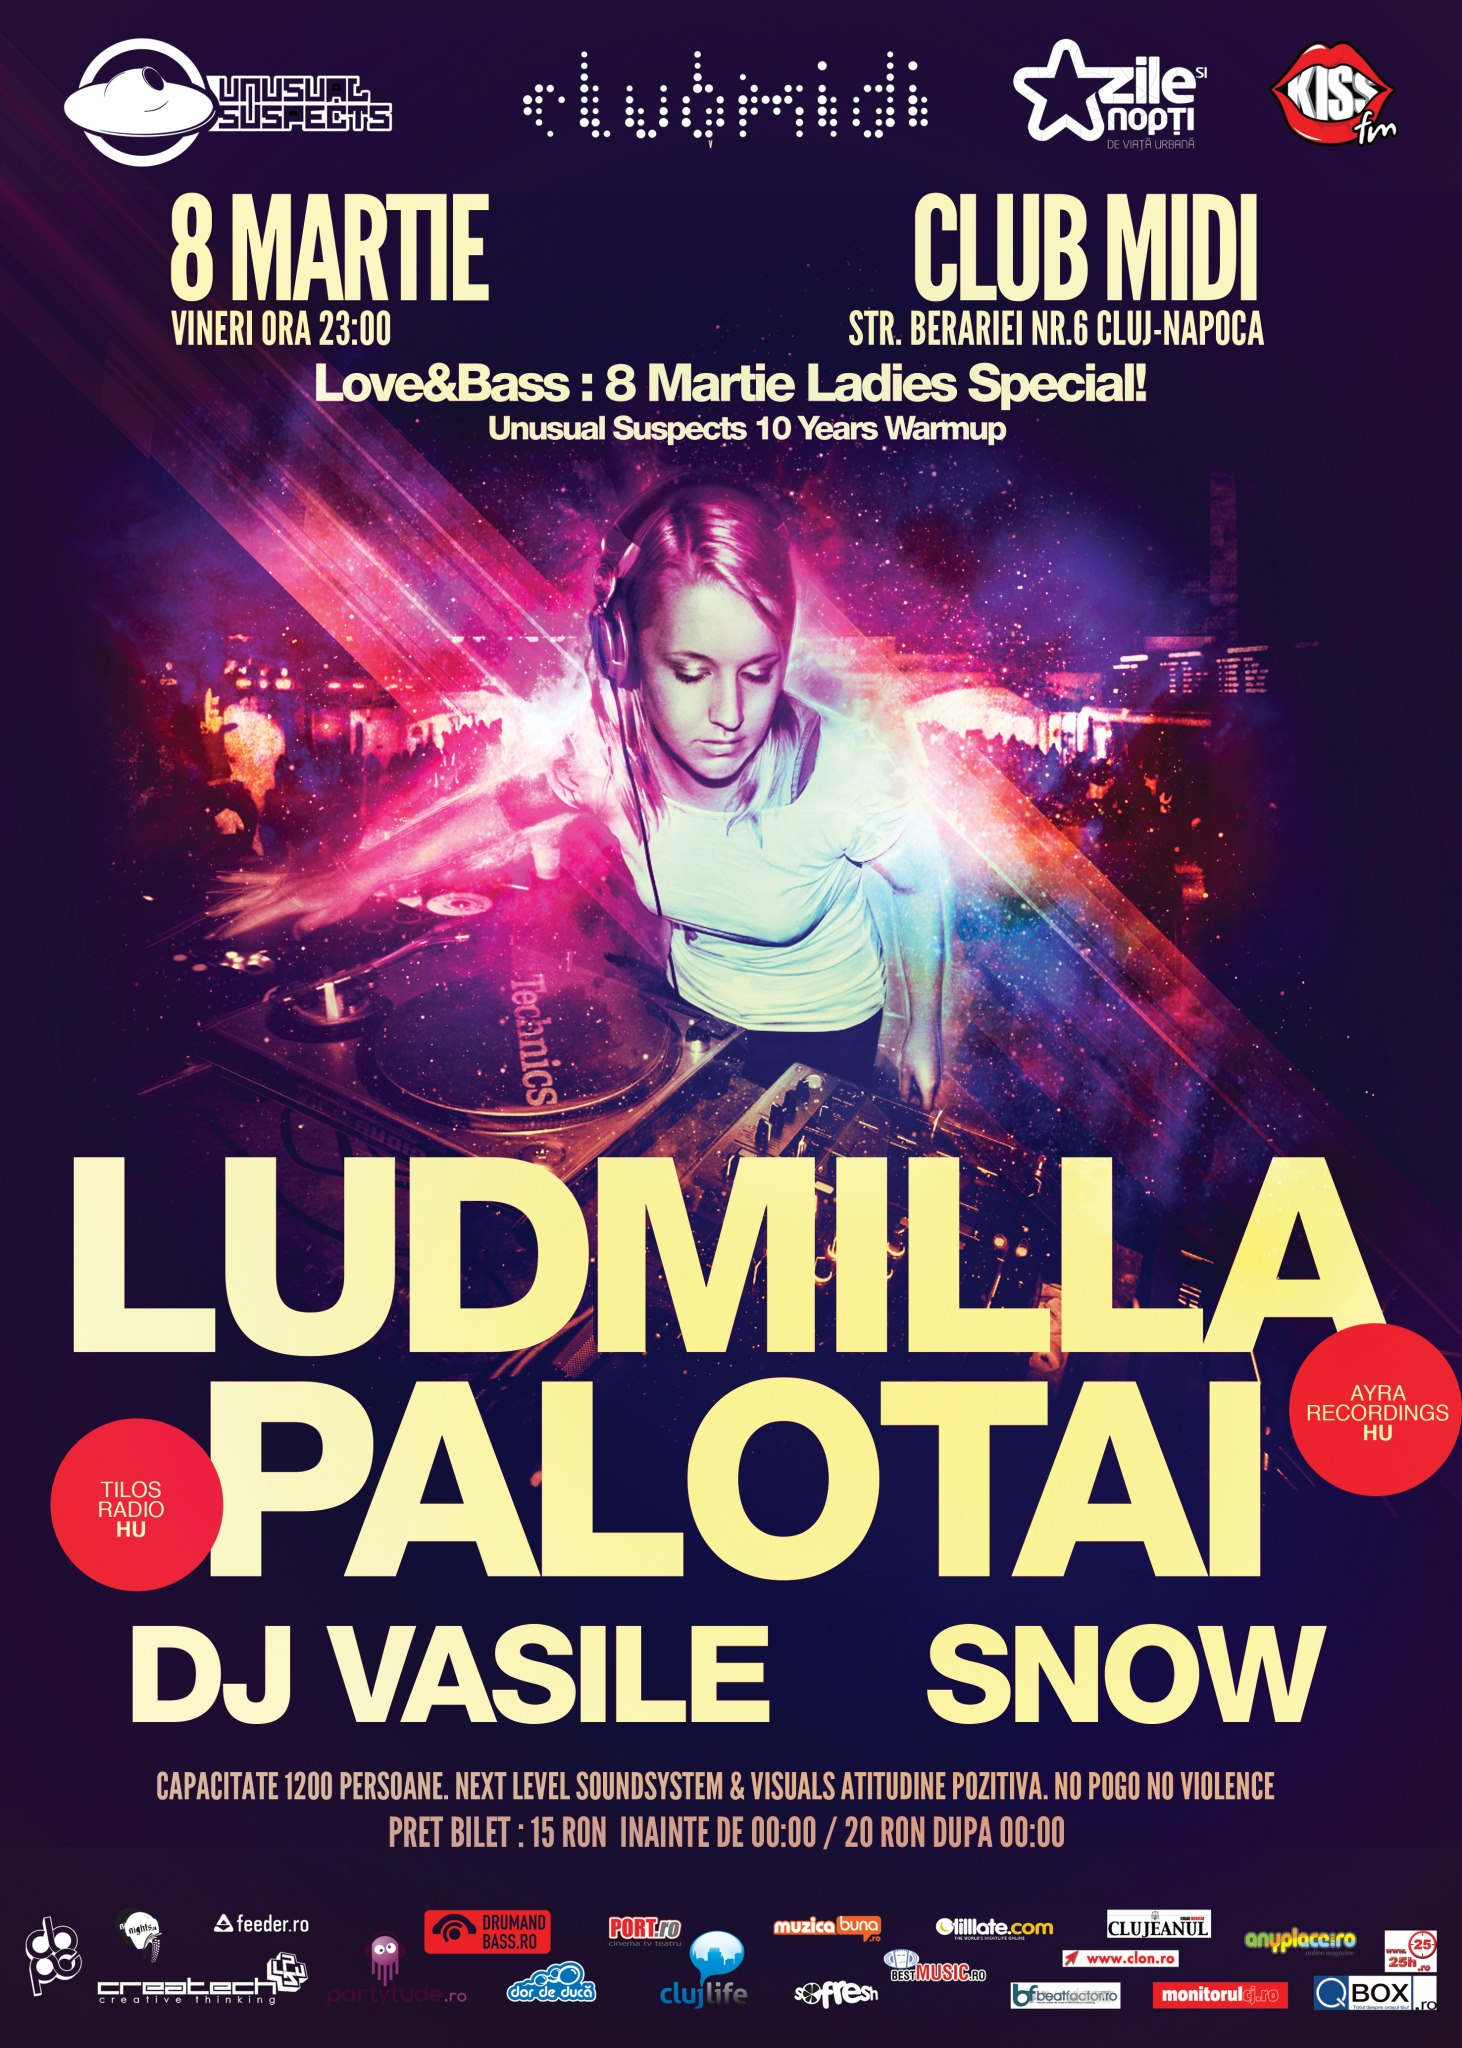 Ludmilla / Palotai @ Club Midi